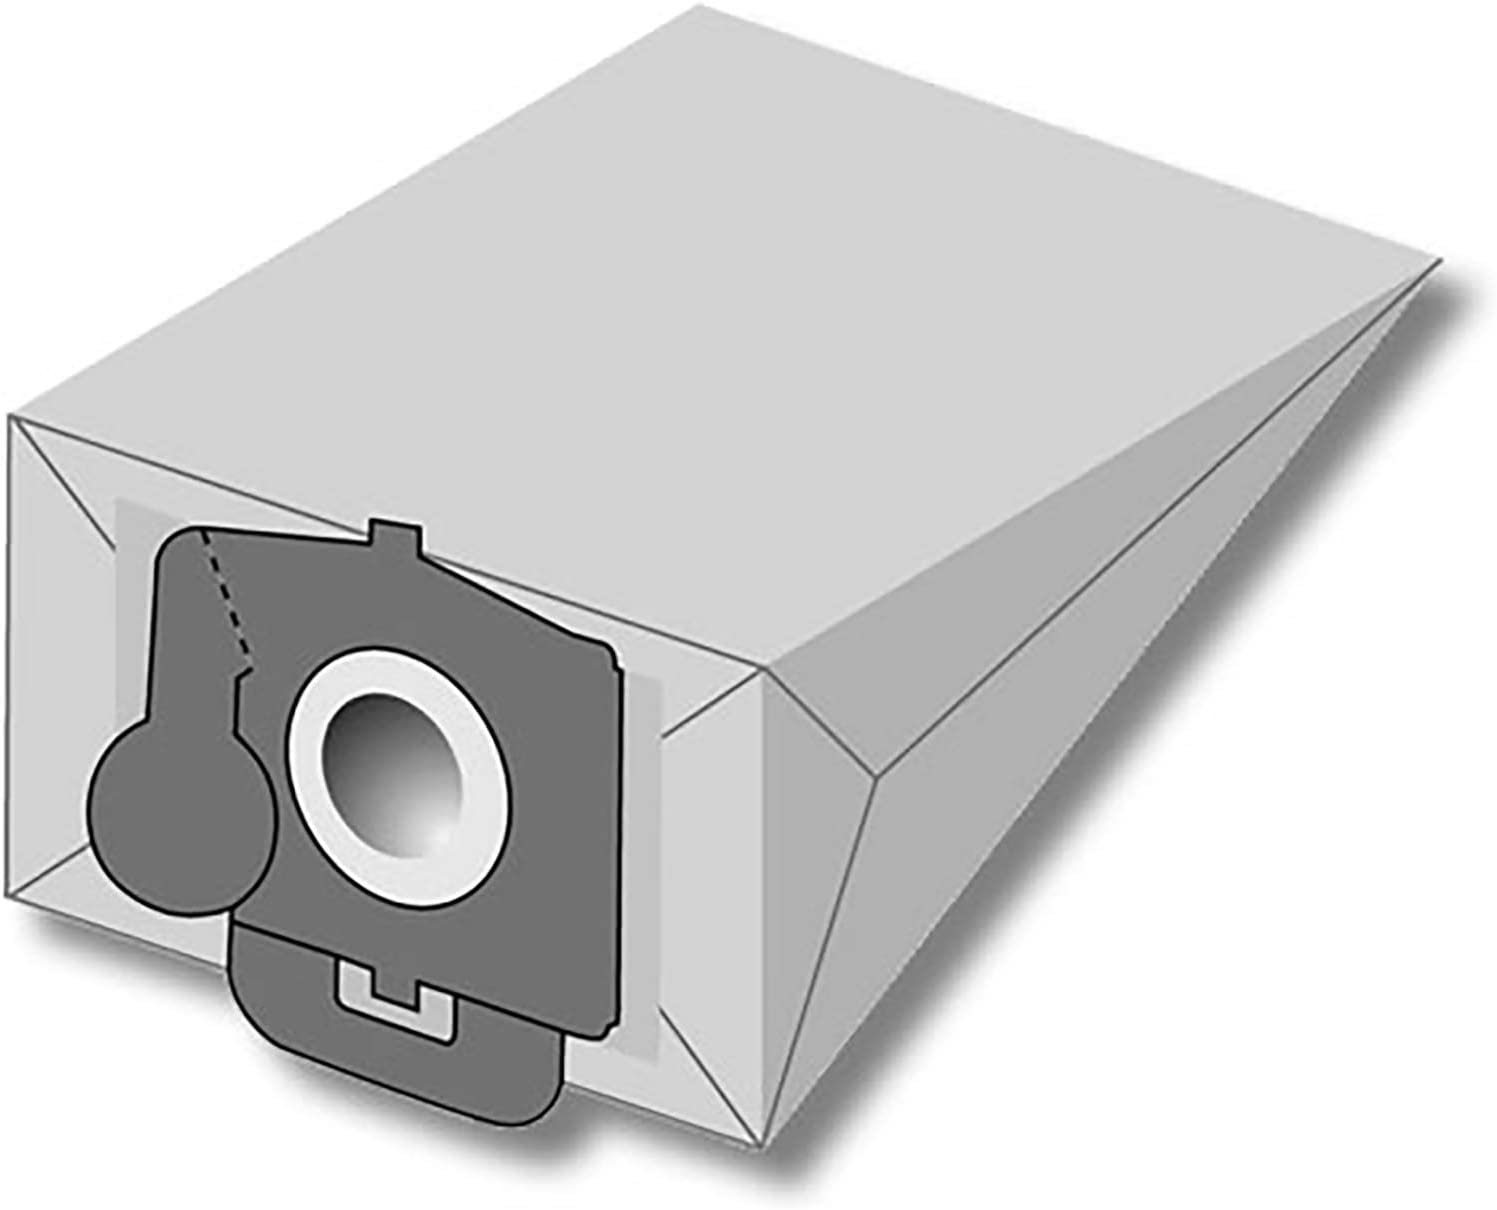 20 Bolsas de aspiradora apta para Carrefour 4107.9   2 capas de papel Bolsa para el polvo de microfibras® 20 bolsas de basura: Amazon.es: Hogar